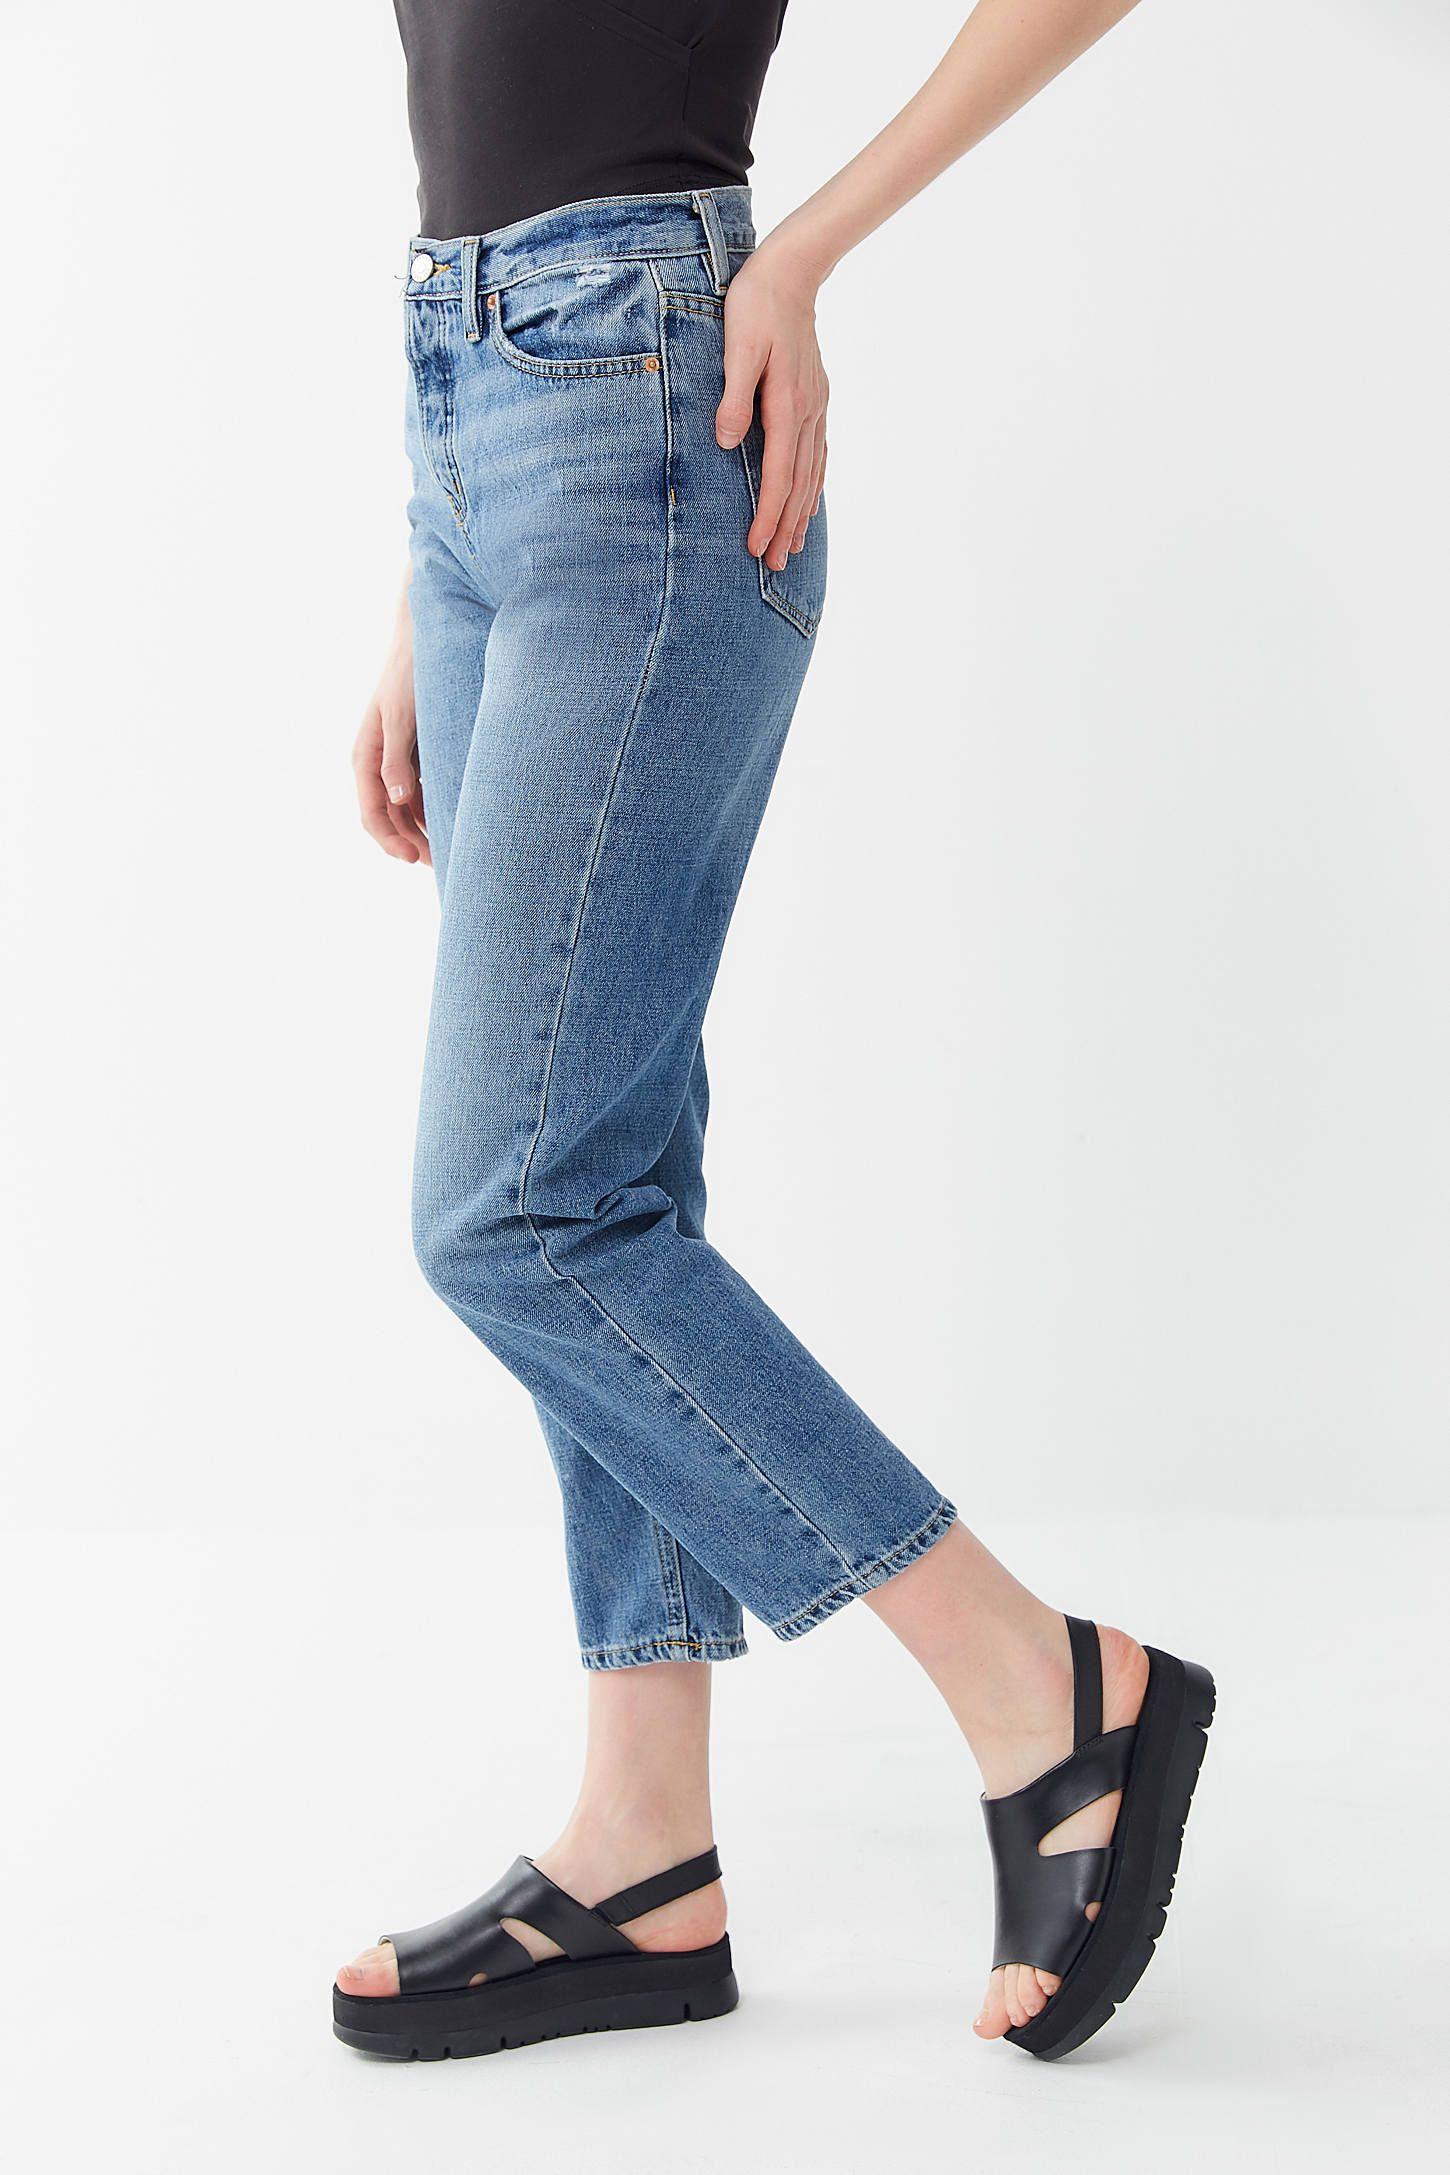 BDG HighWaisted Slim Straight Jean Medium Wash Slim